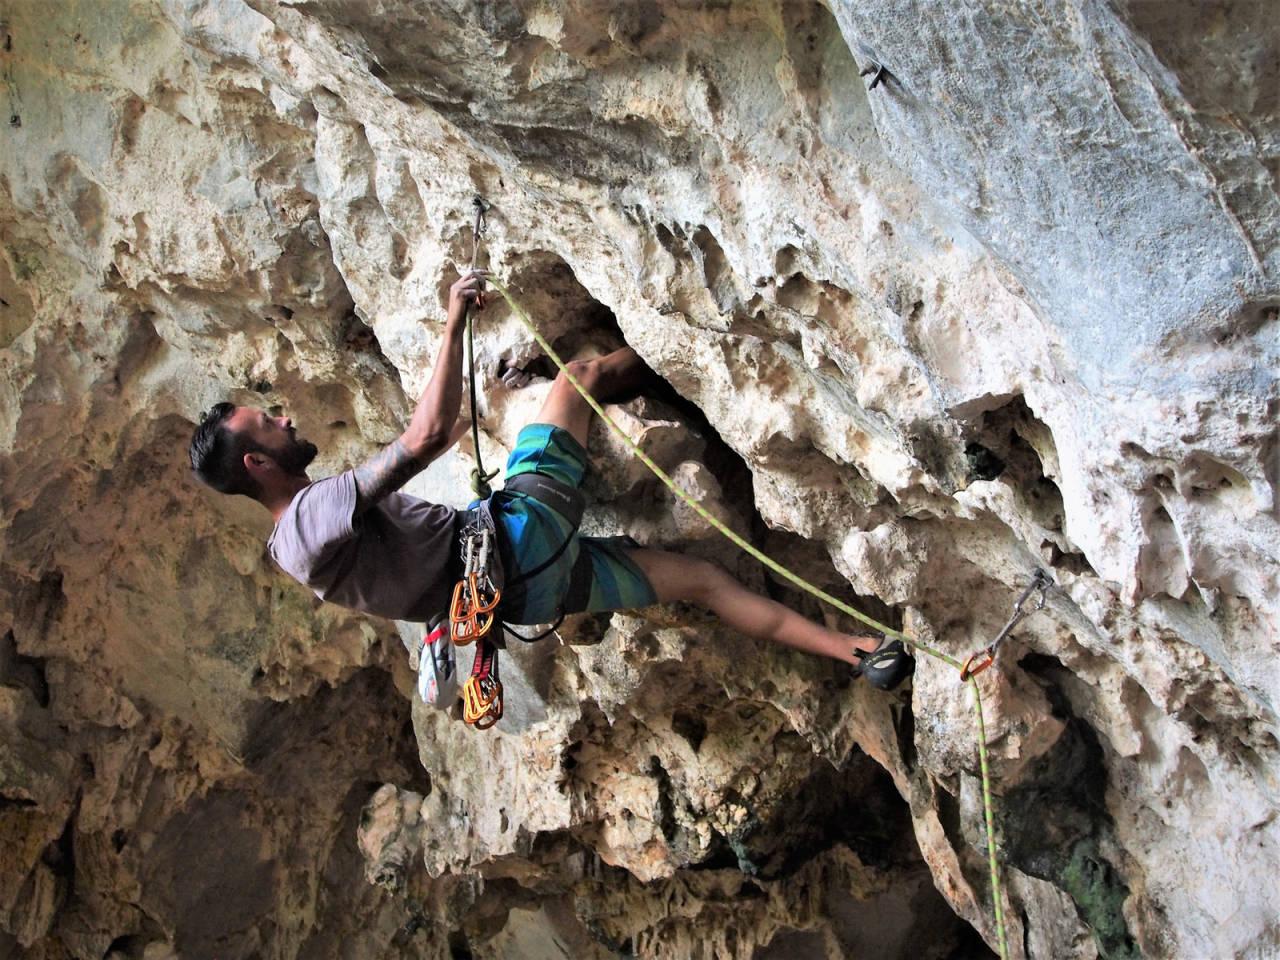 Cuba klatring fjellklatring